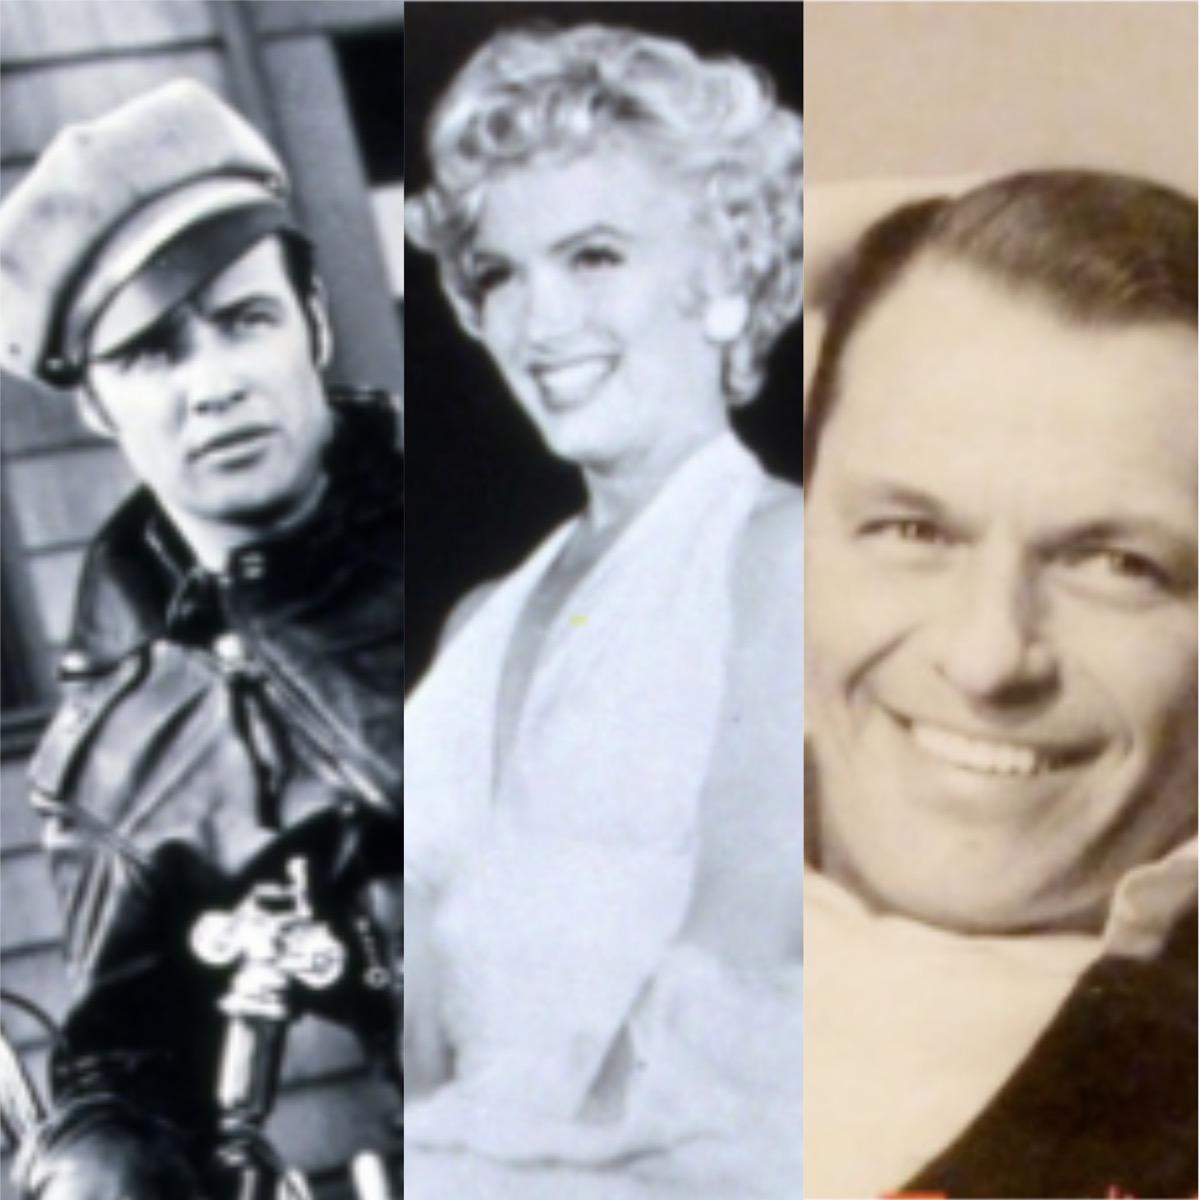 Marlon Brando, Marilyn Monroe, and Frank Sinatra